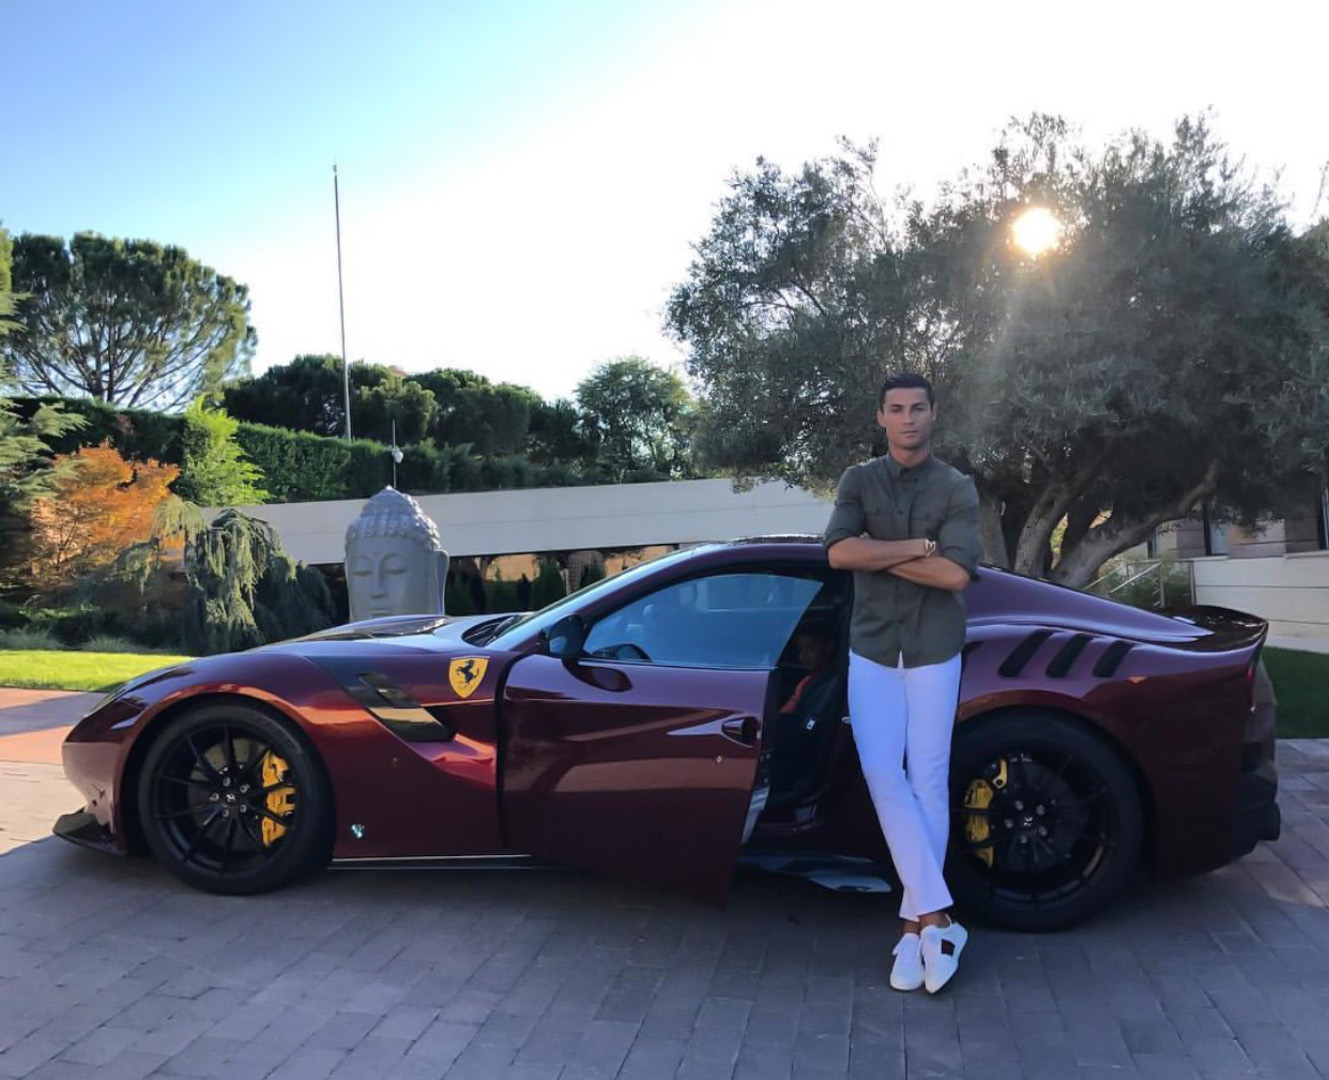 CP-Bộ sưu tập xe của Cristiano Ronaldo (6).jpg